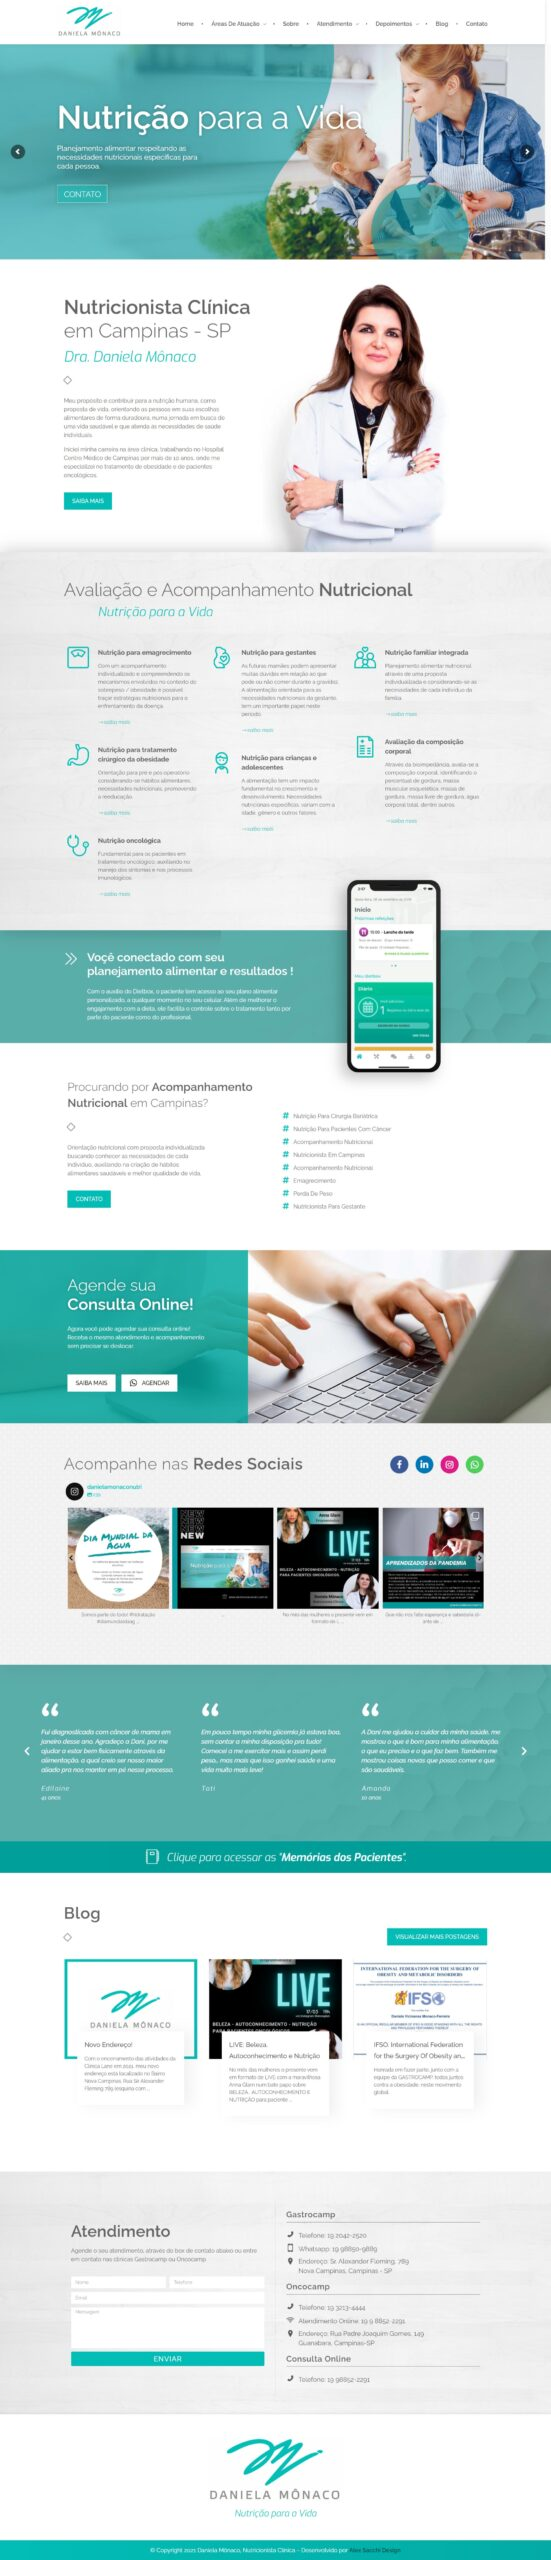 layout web designer site